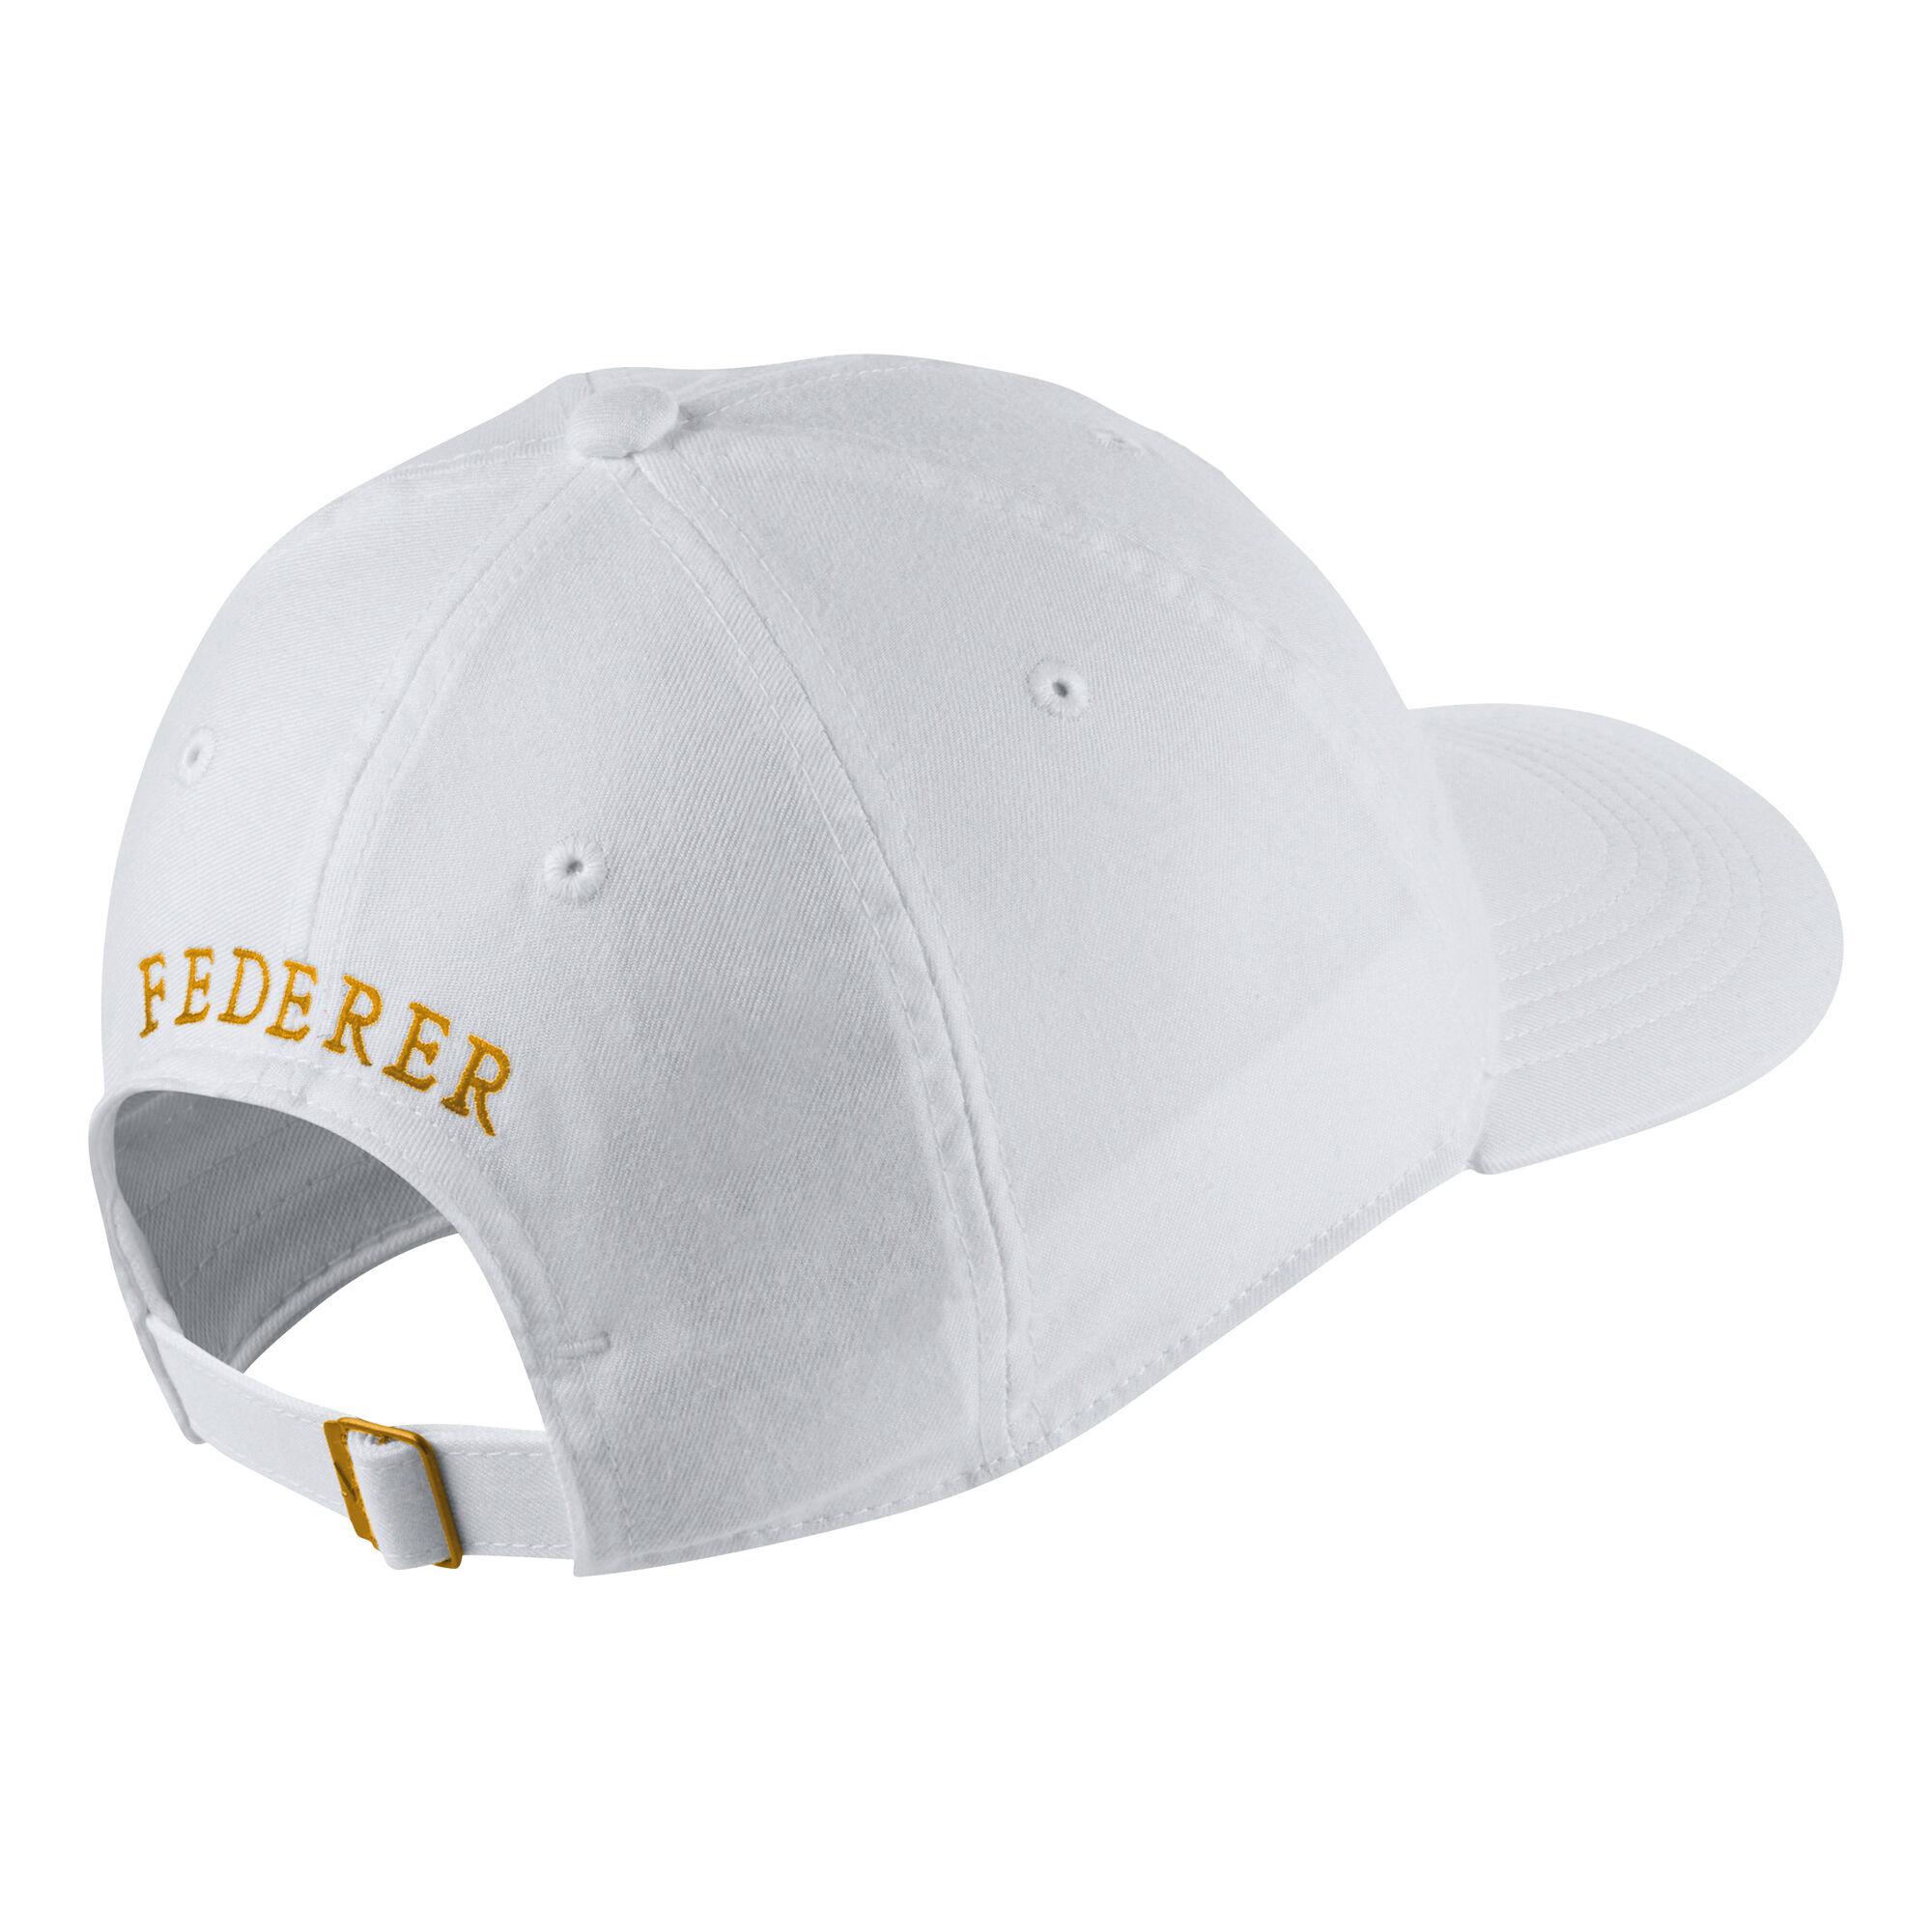 Refinería Ingenieros regular  Nike Roger Federer 20th Celebration Gorra - Blanco, Dorado compra online |  Tennis-Point